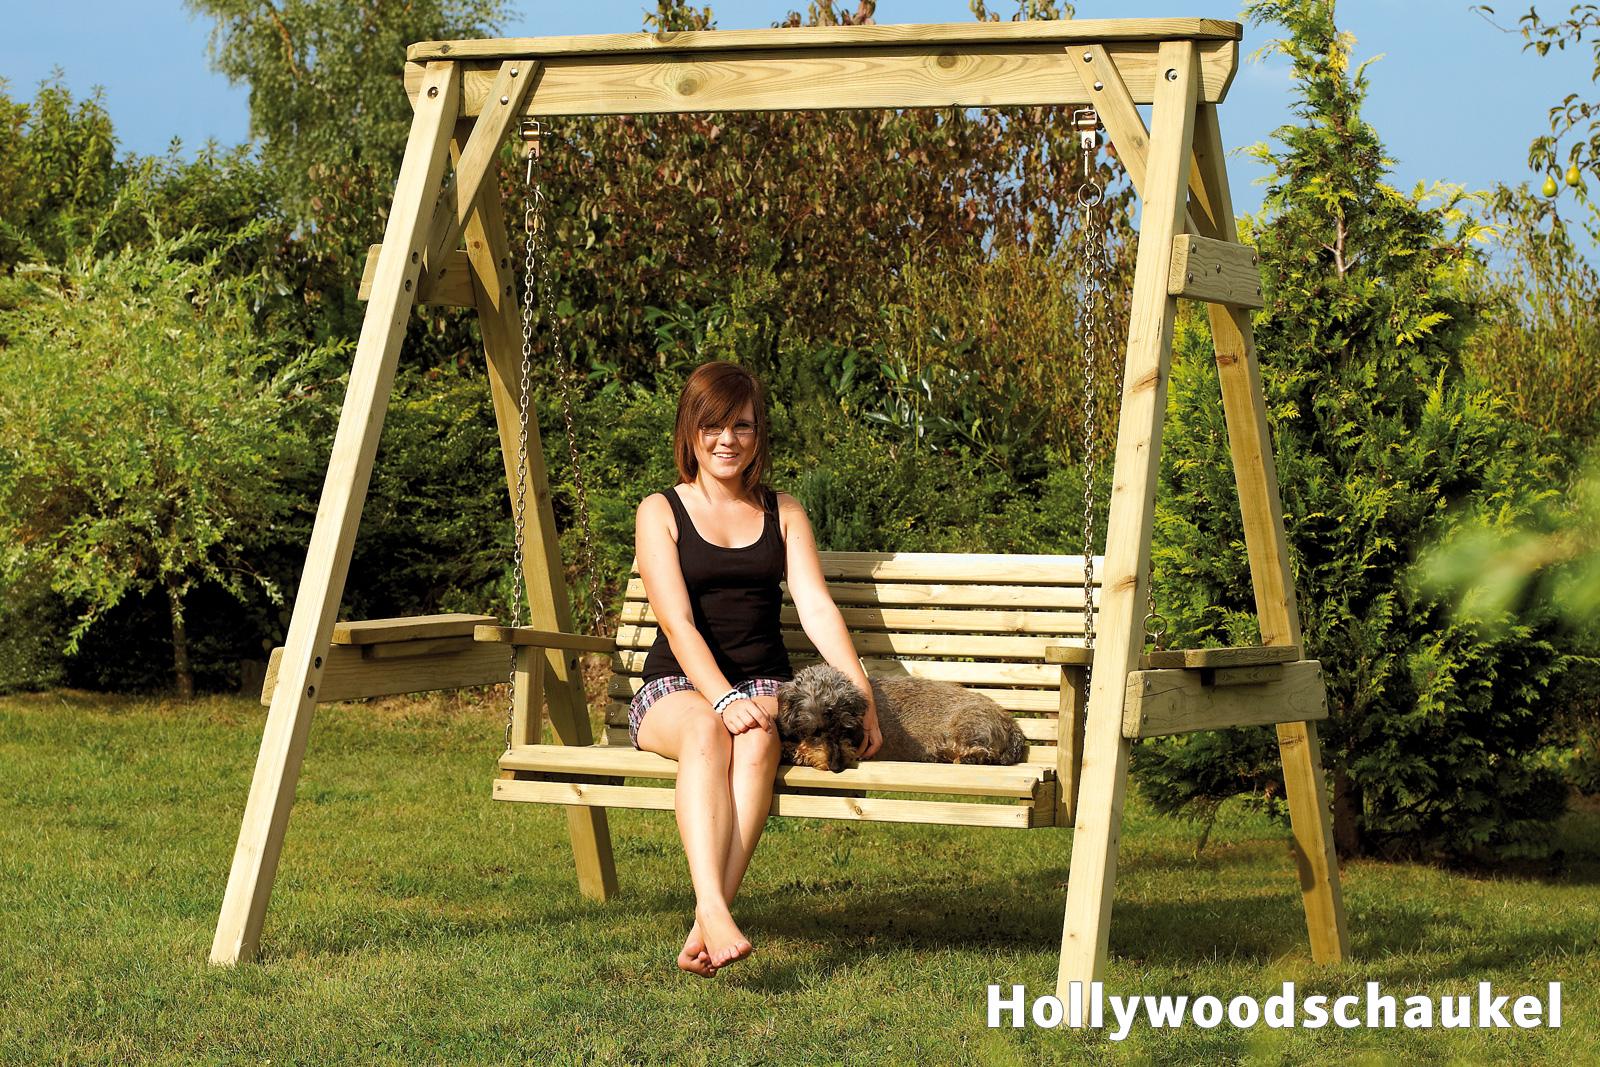 hollywoodschaukel jetzt bei bauking direkt bestellen. Black Bedroom Furniture Sets. Home Design Ideas